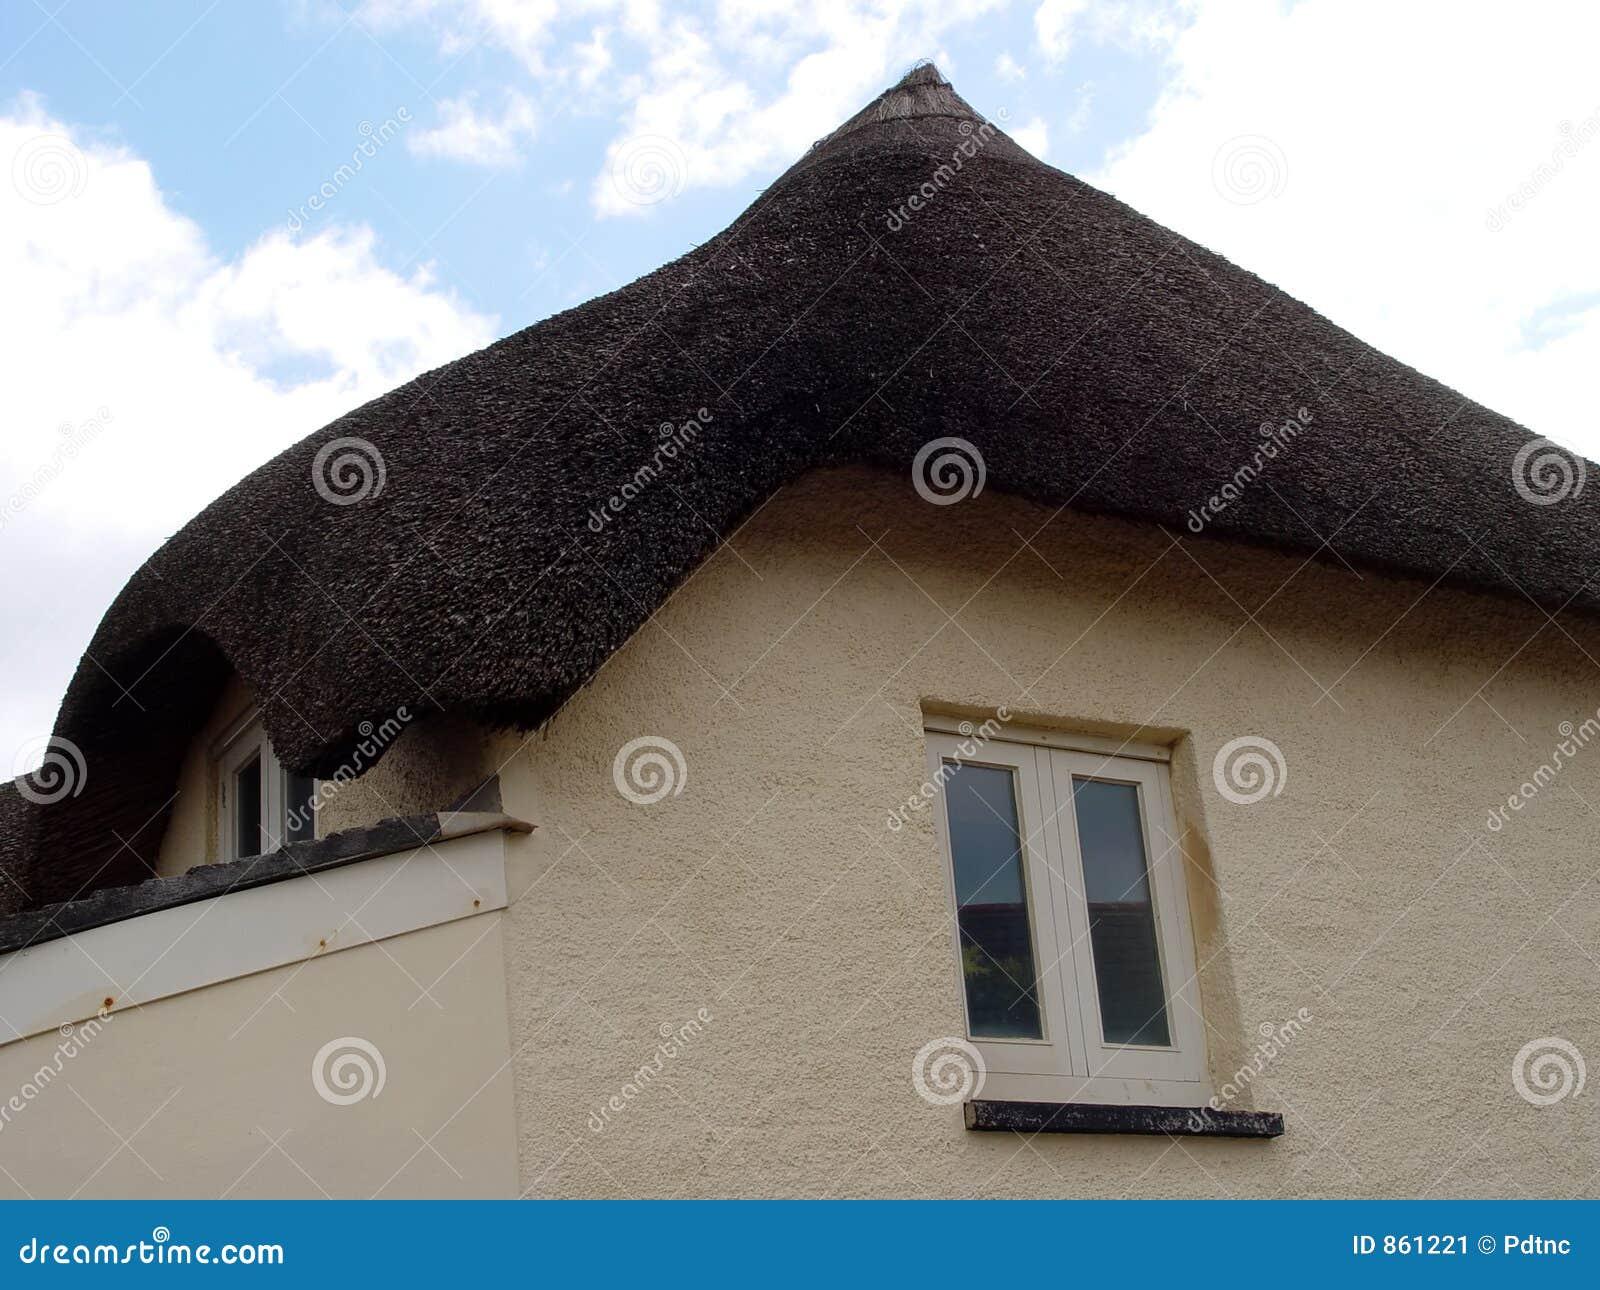 Cabaña cubierta con paja